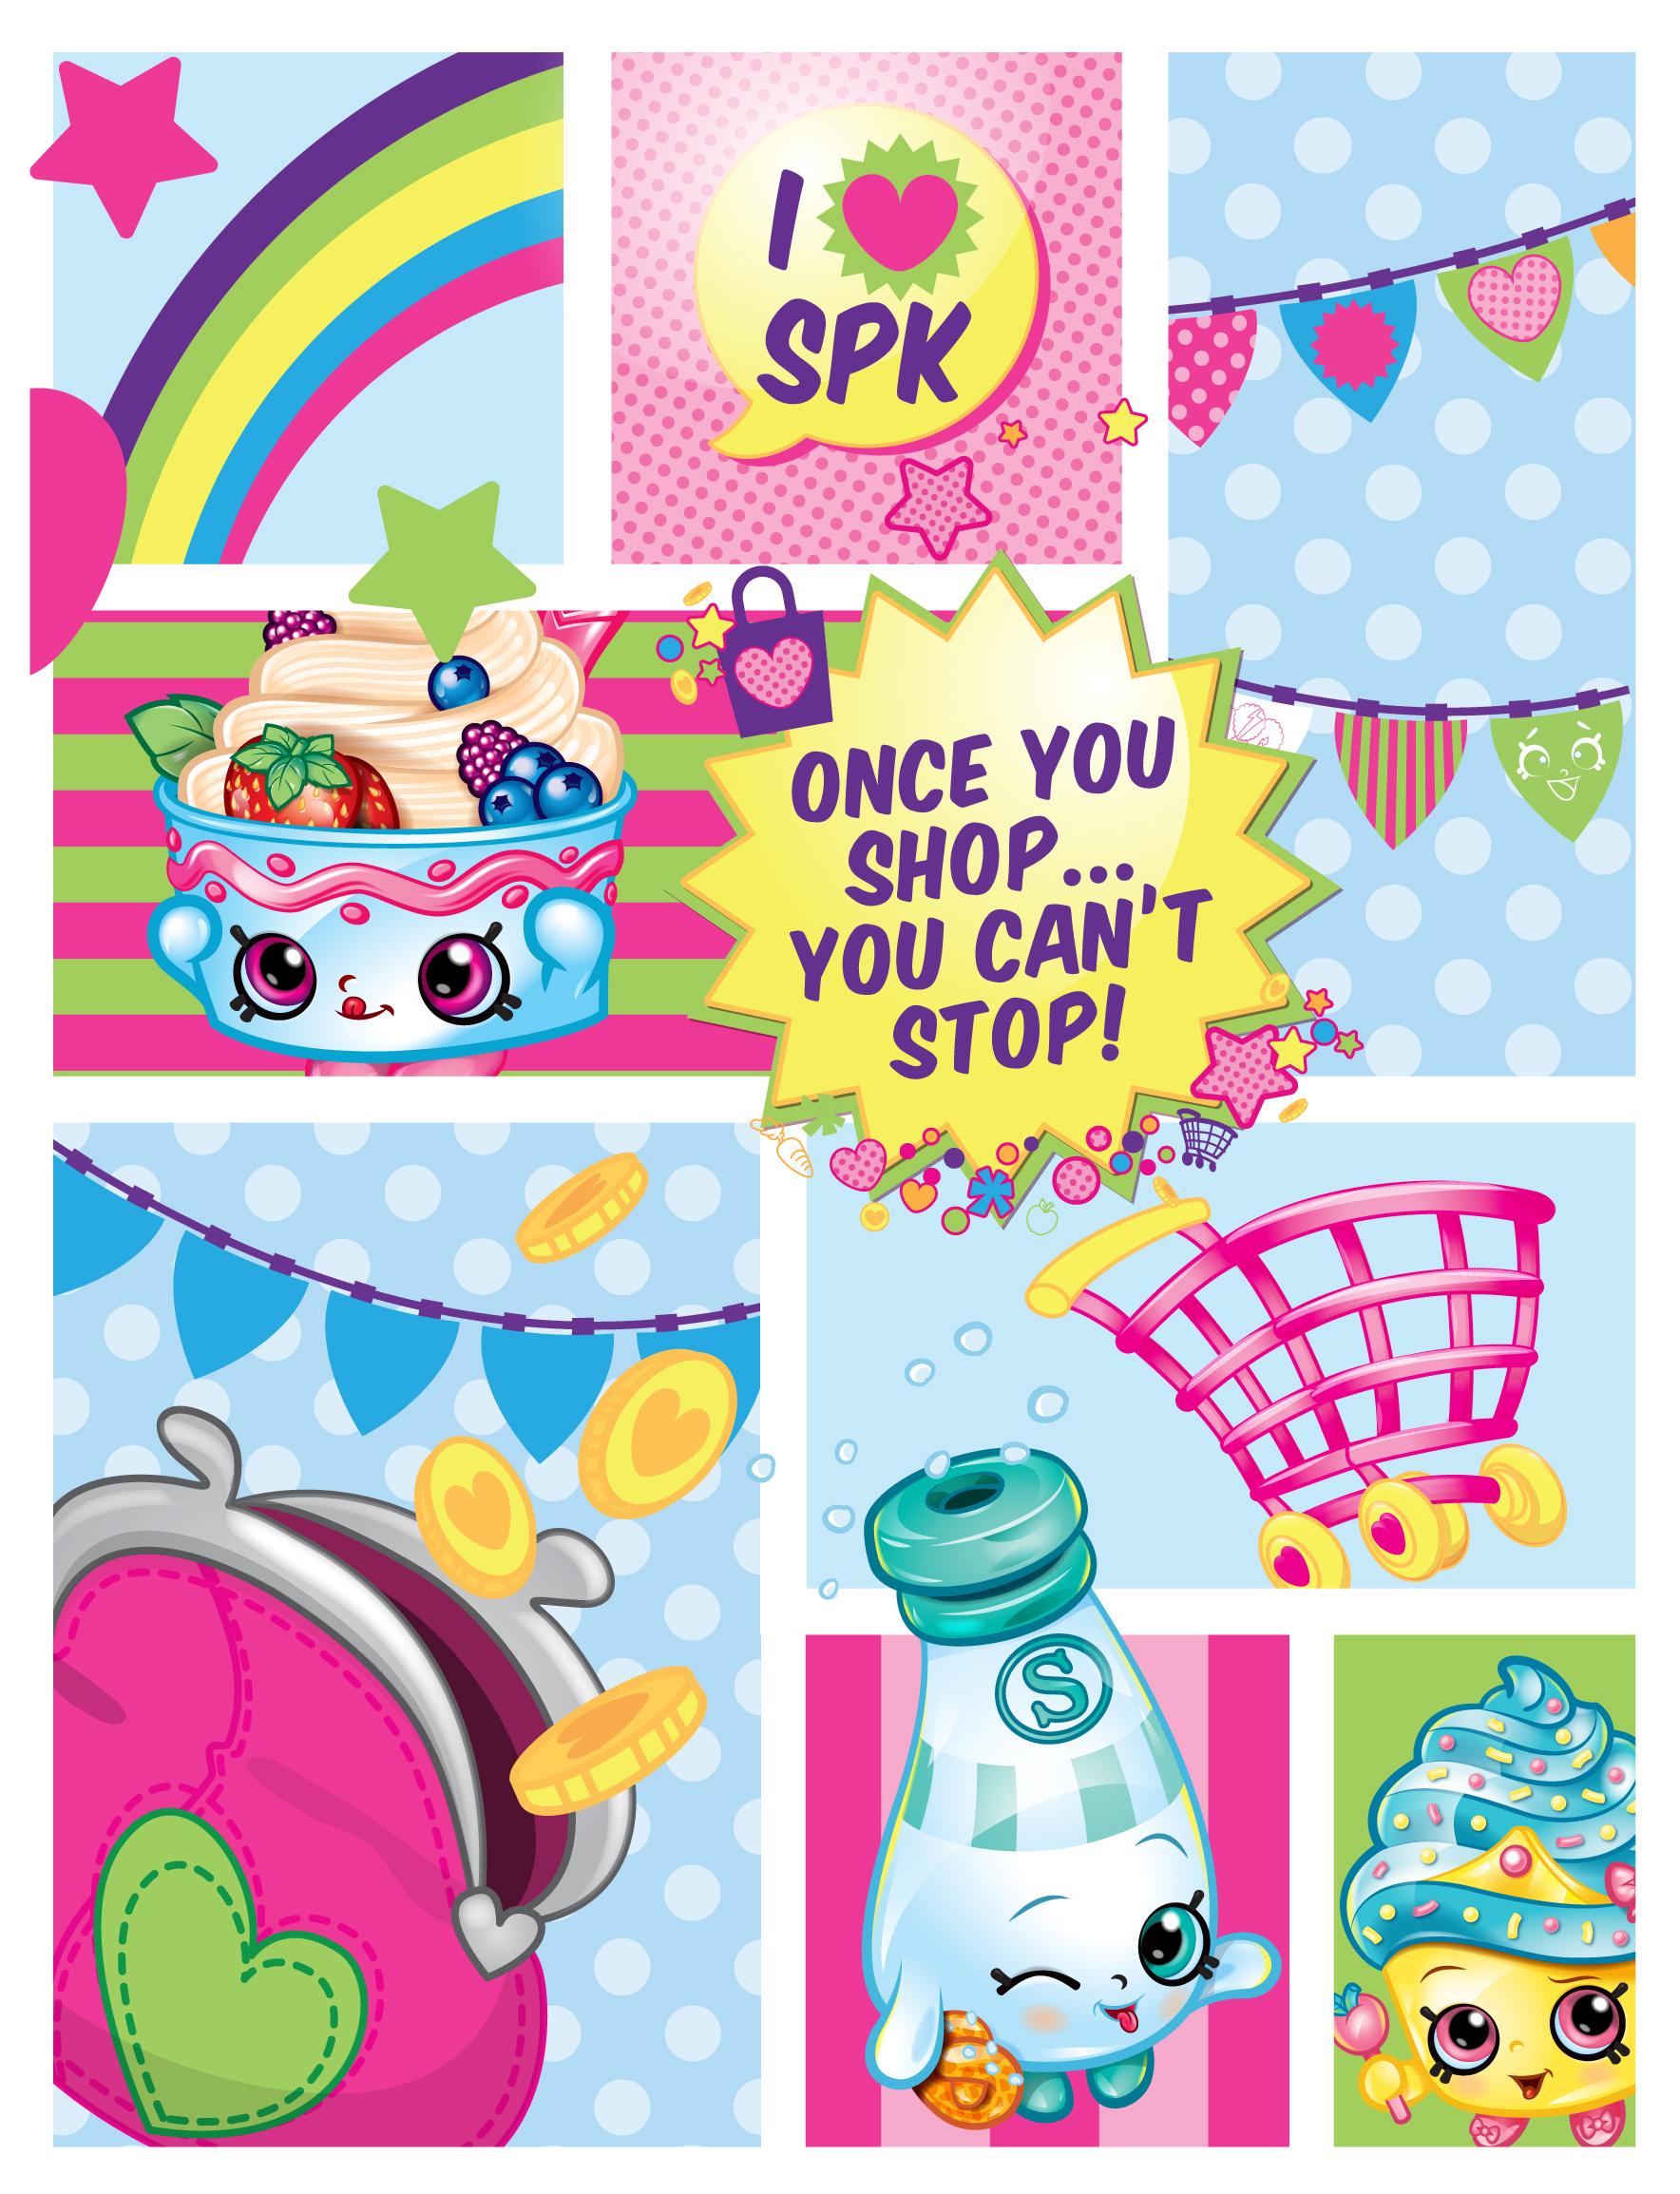 Shopkins wallpaper free wallpapersafari - Shopkins wallpaper ...